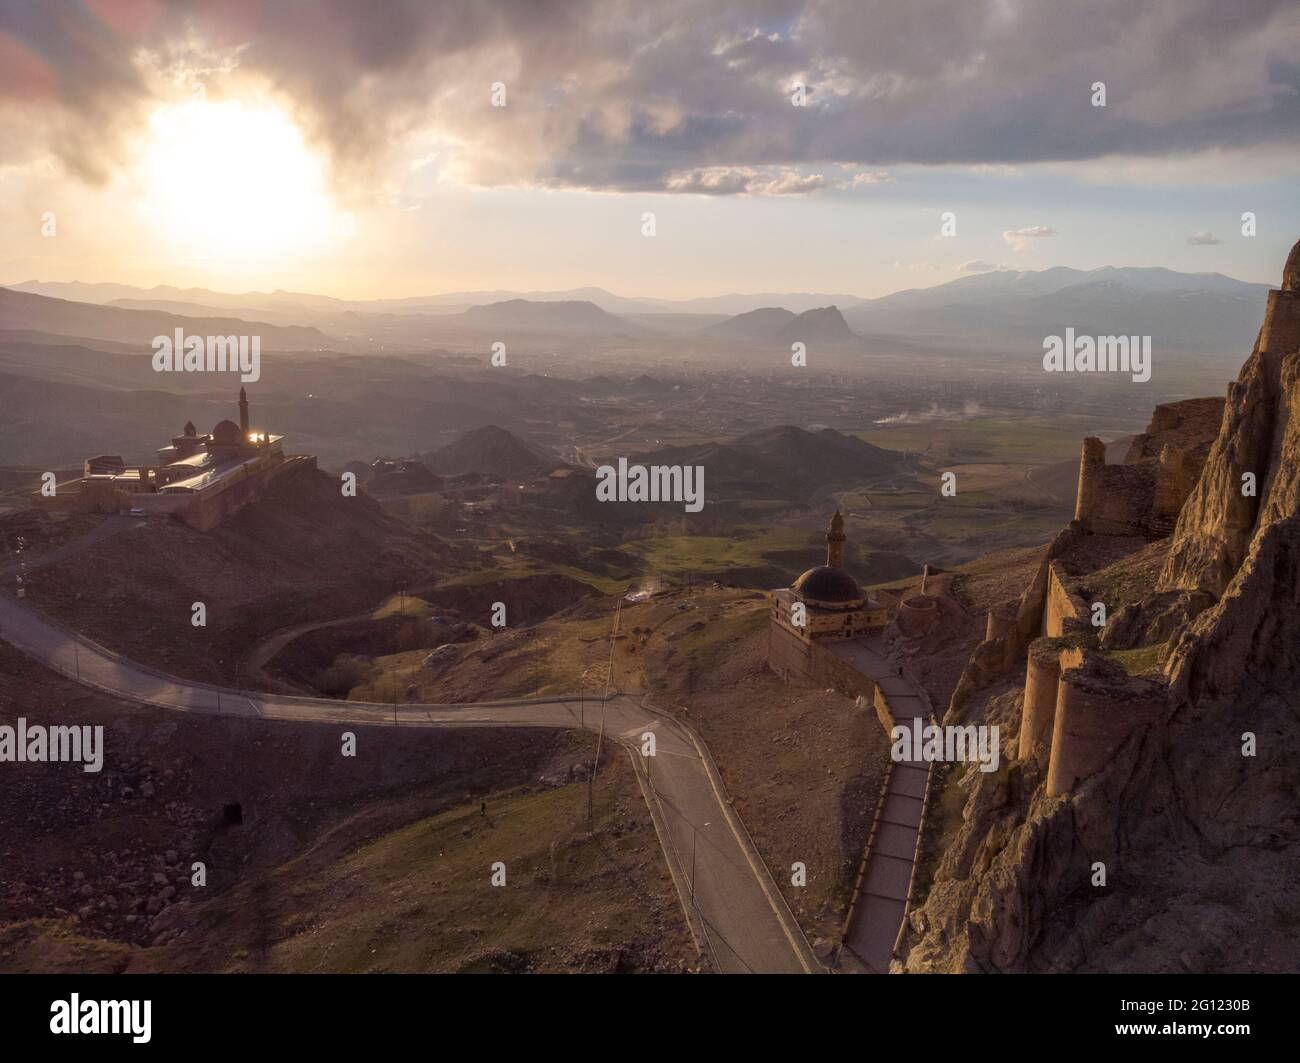 Fantastic Dramatic Aerial view of the ruins of the Dogubayazit castle, built on the mountain near Eski Bayezid Cami and the Ishak Pasha Palace Stock Photo